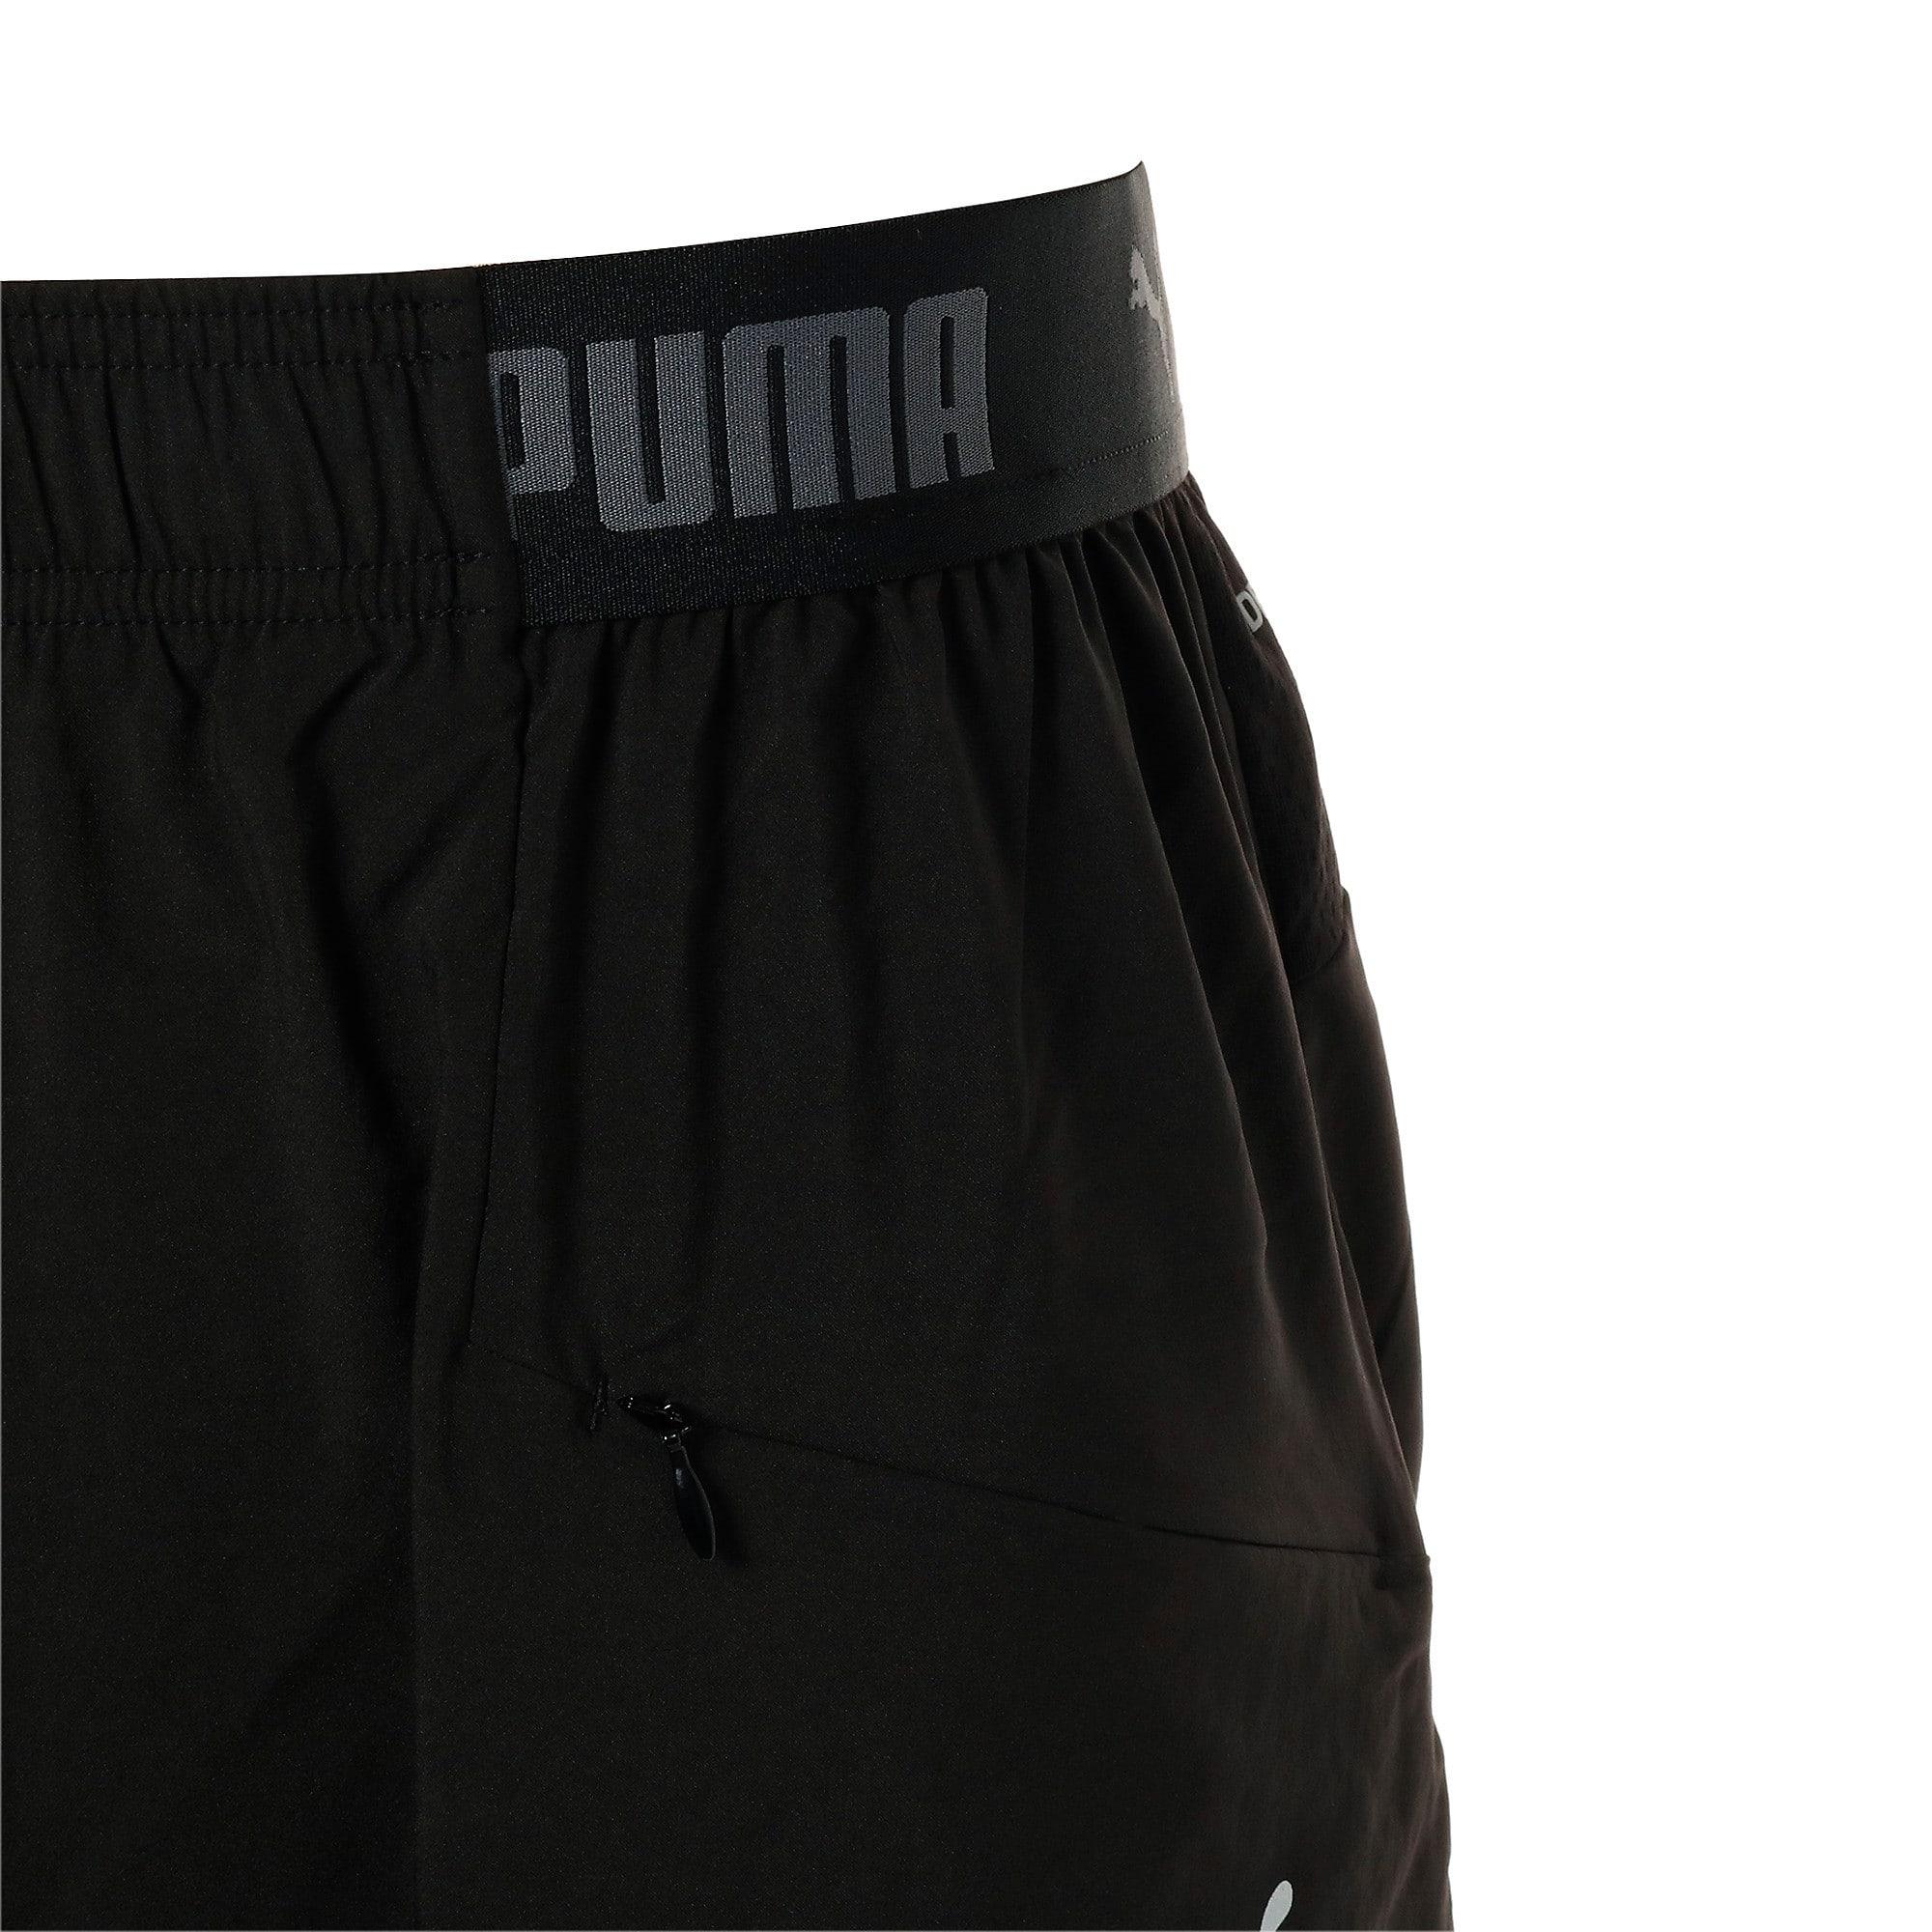 Thumbnail 5 of AC MILAN プロ パンツ, Puma Black, medium-JPN